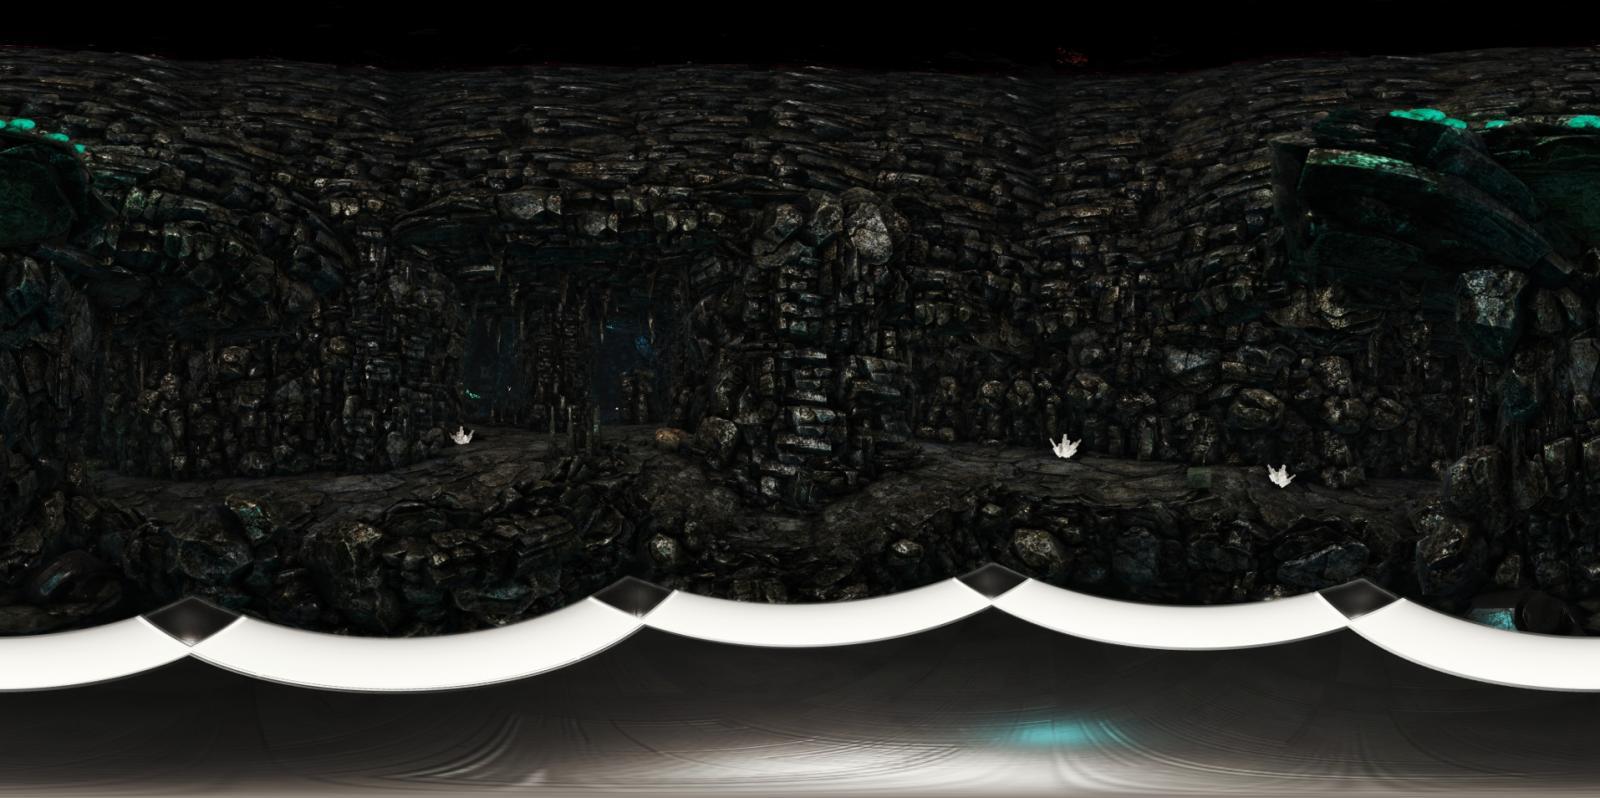 large.582fe53ddafef_KISHK0-KISHK0-AUniquePerspective360Stereosta.jpg